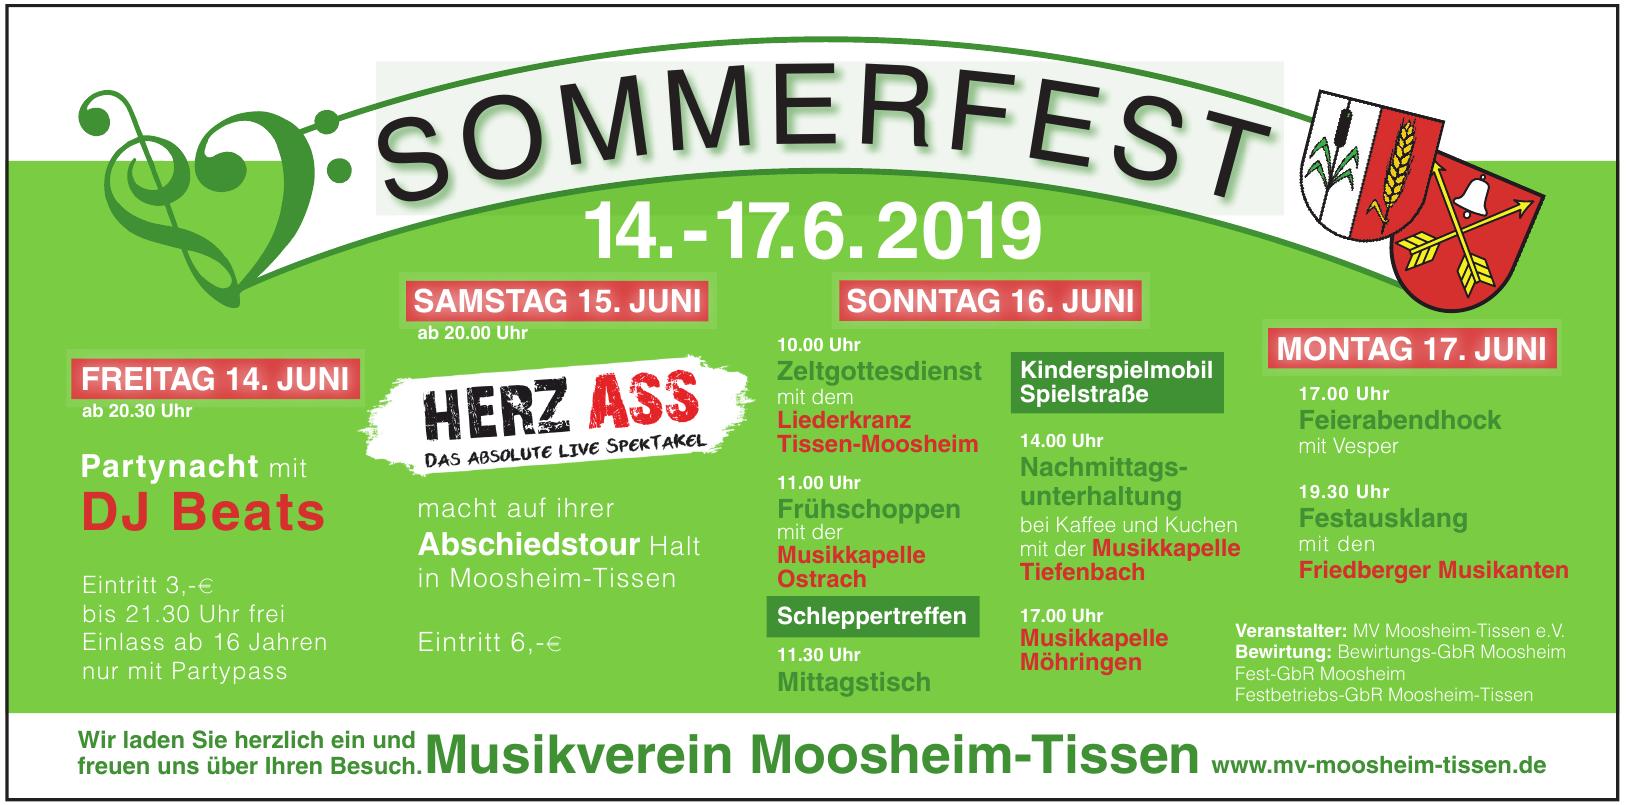 MV Moosheim-Tissen Sommerfest